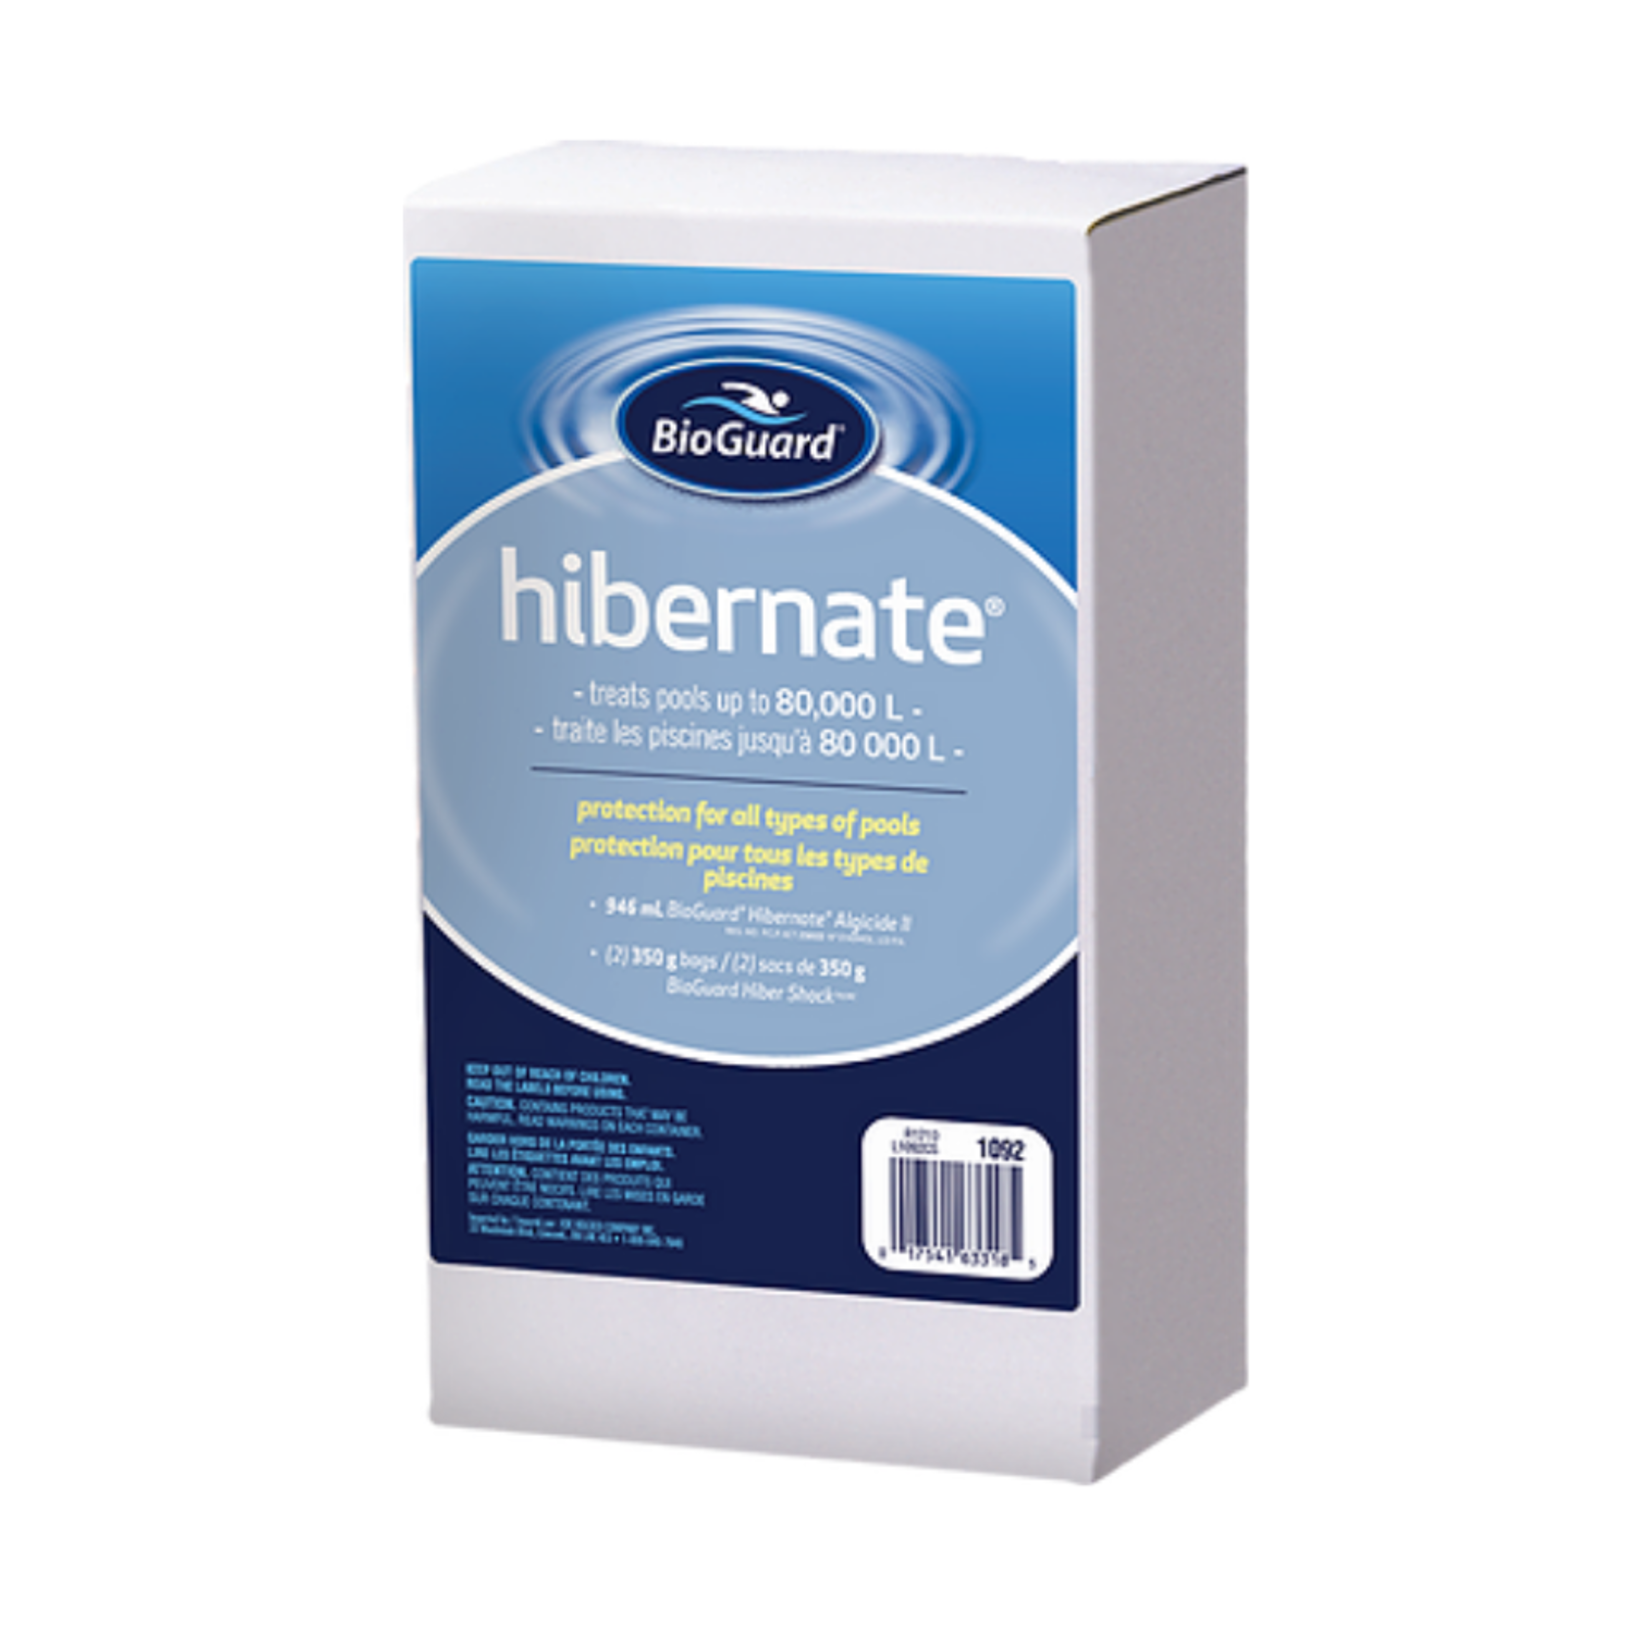 BioGuard Hibernate® Closing Kit - 80